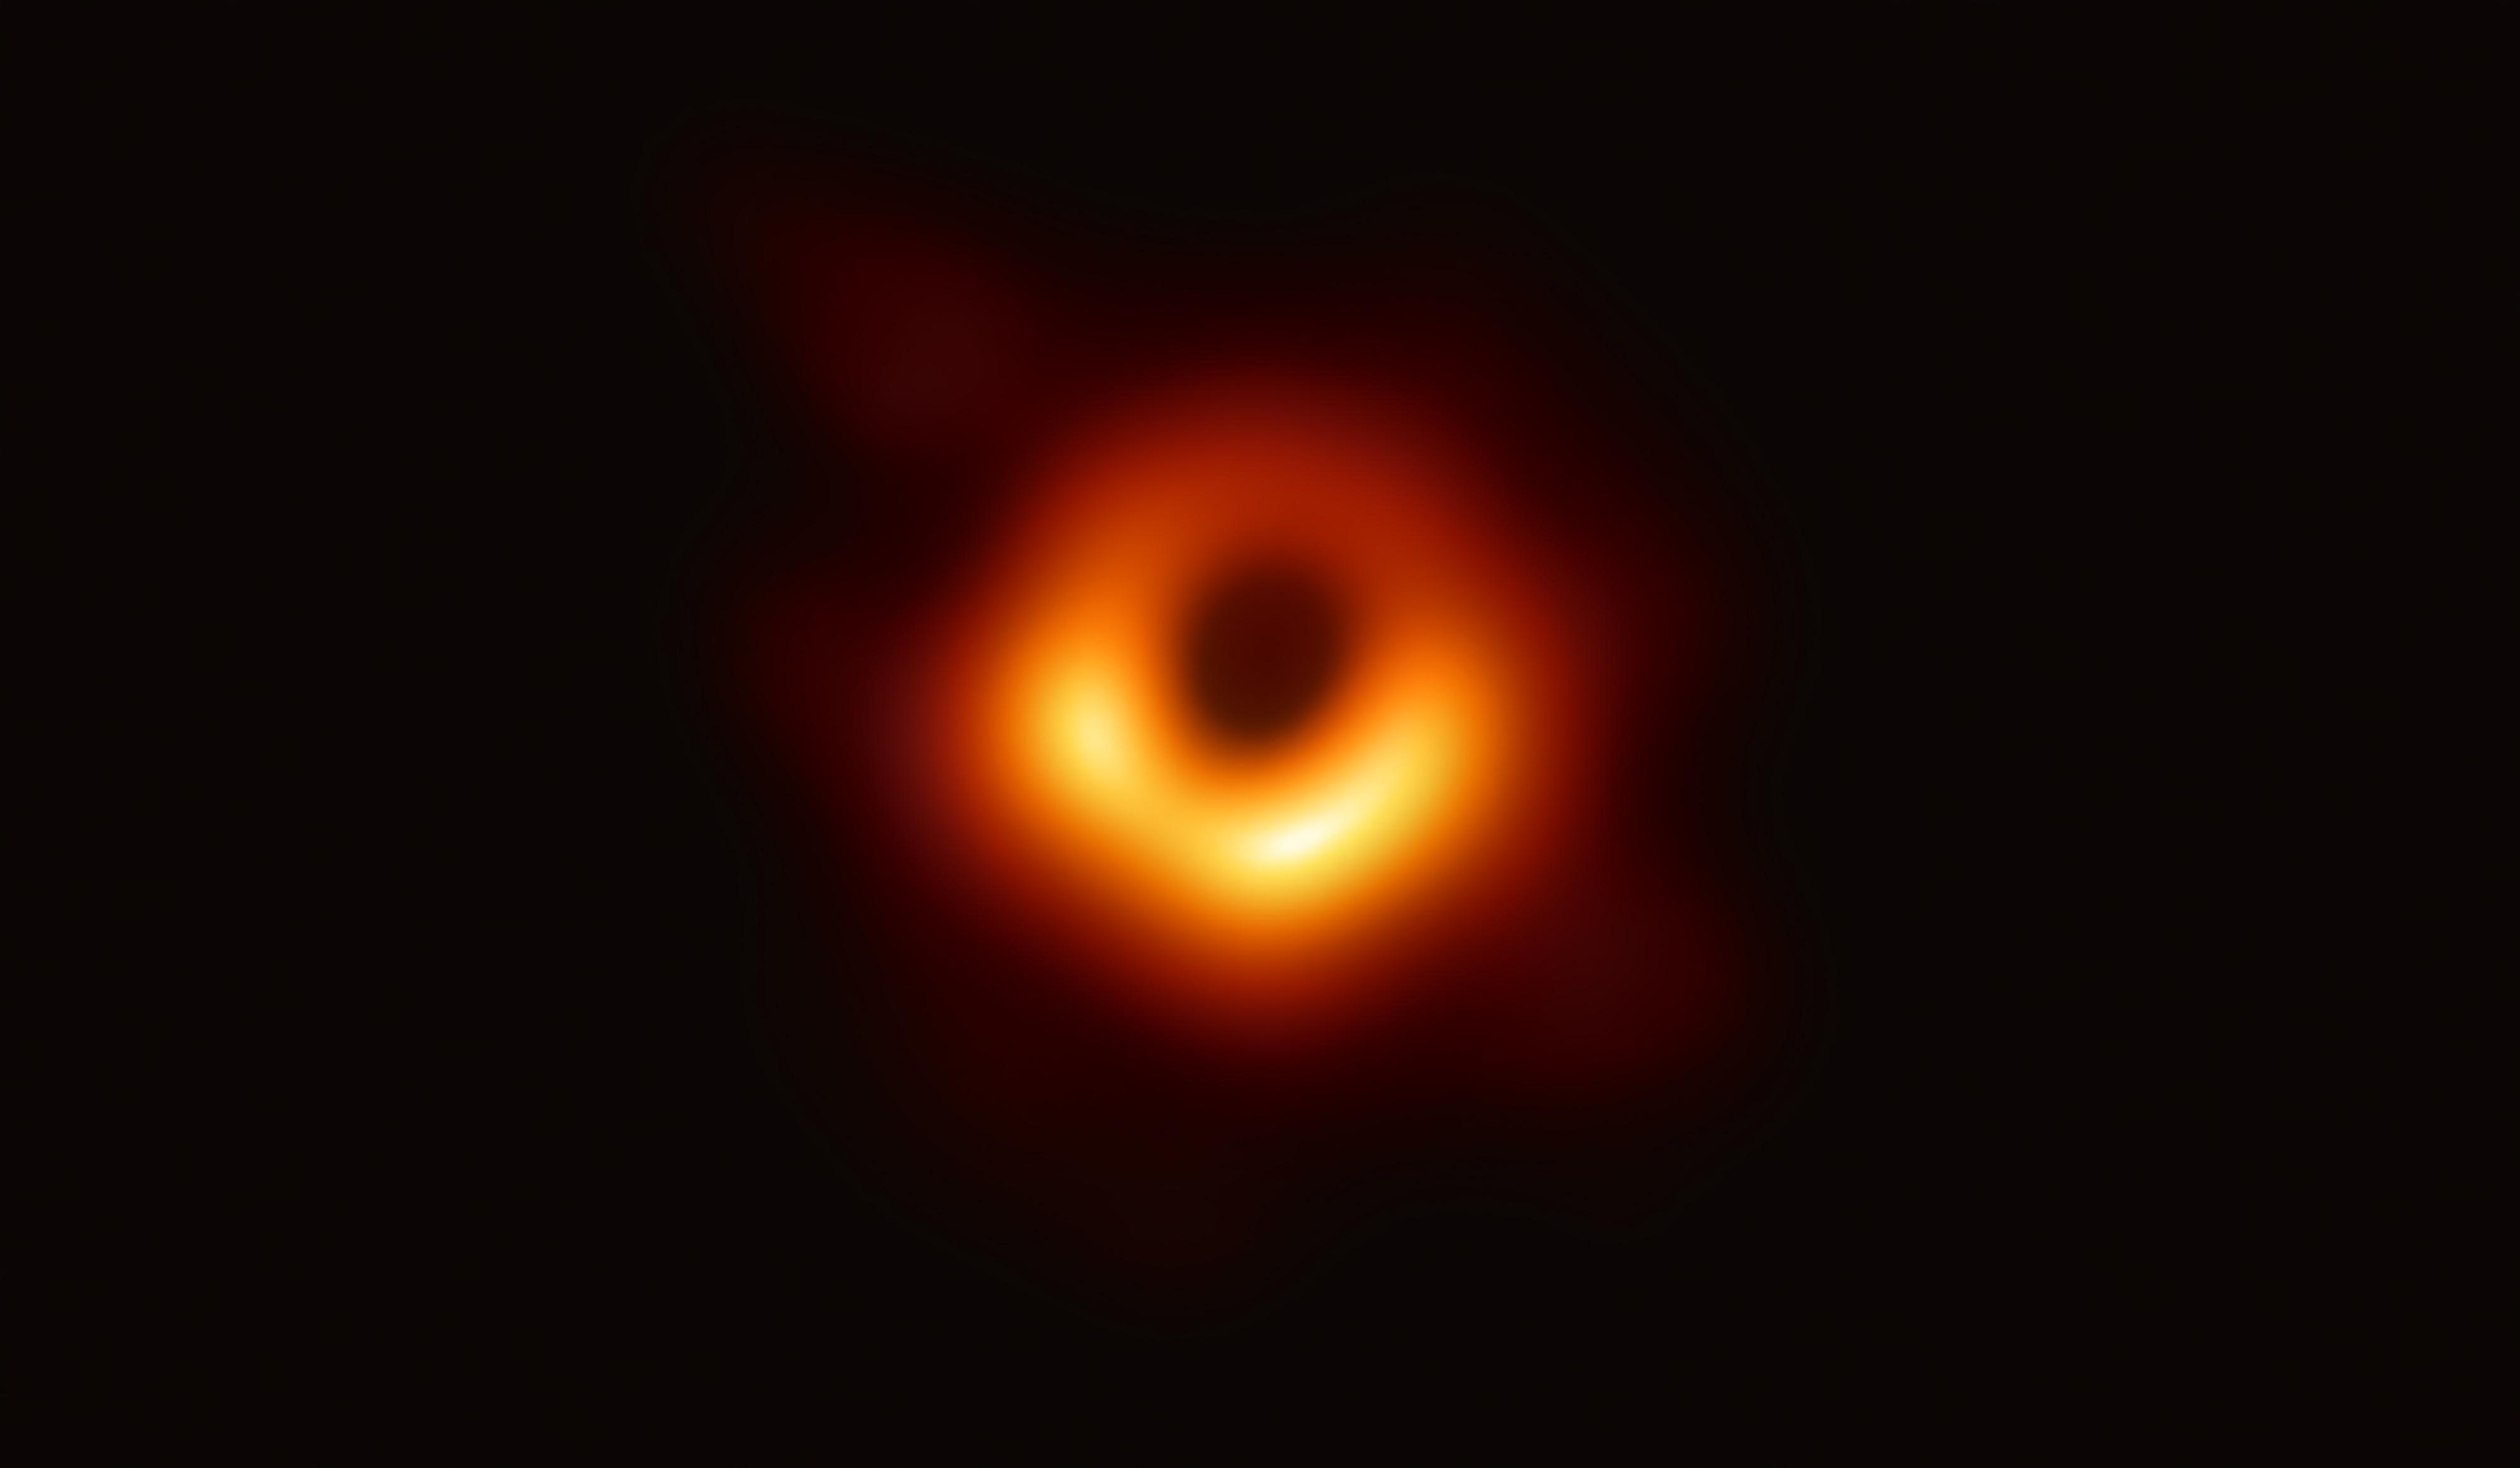 Picture credit: Black Hole in Galaxy Messier 87, Event Horizon Telescope collaboration et al.